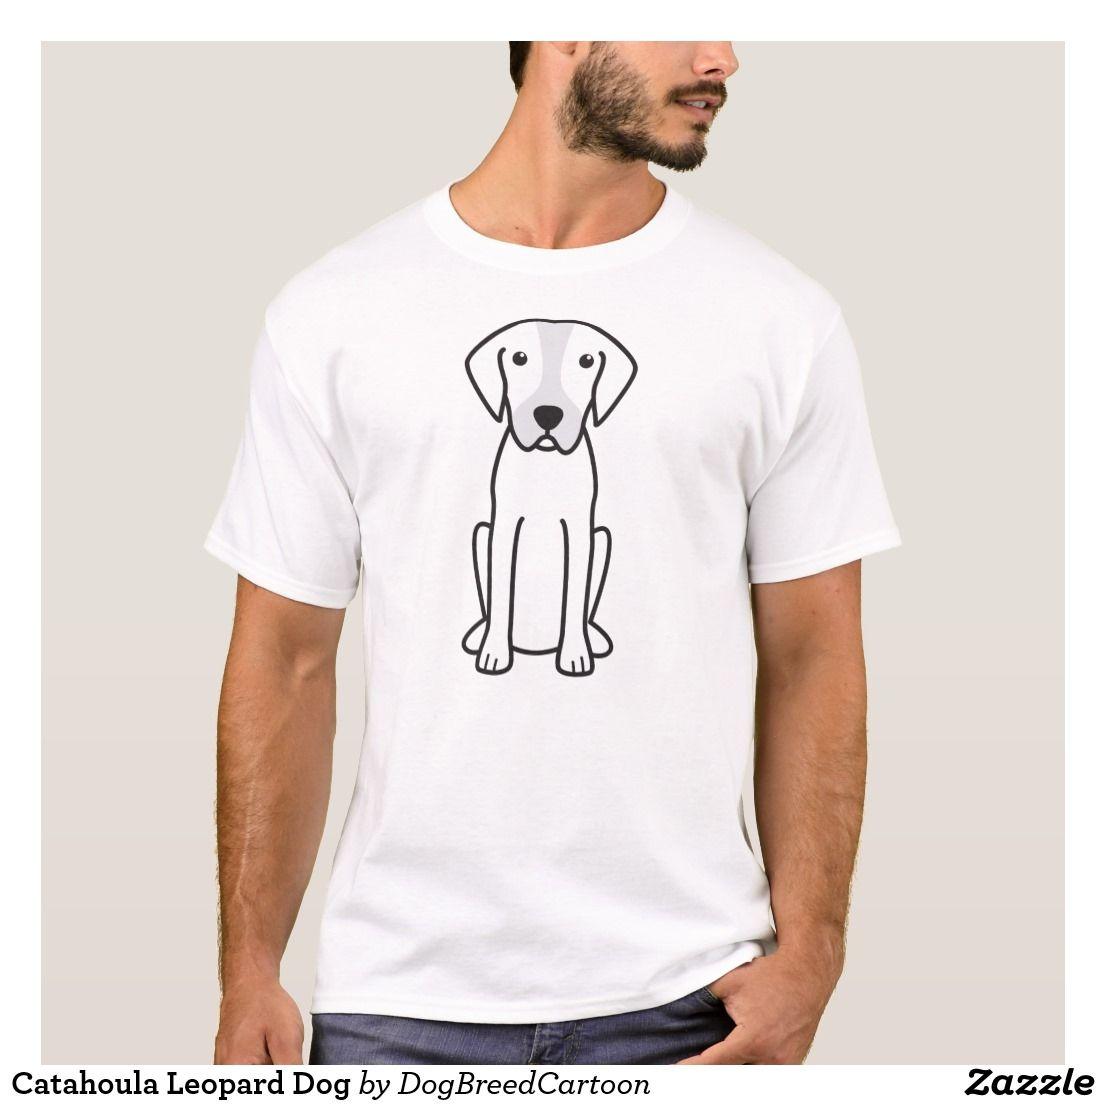 Catahoula Leopard Dog T-Shirt | Zazzle.com